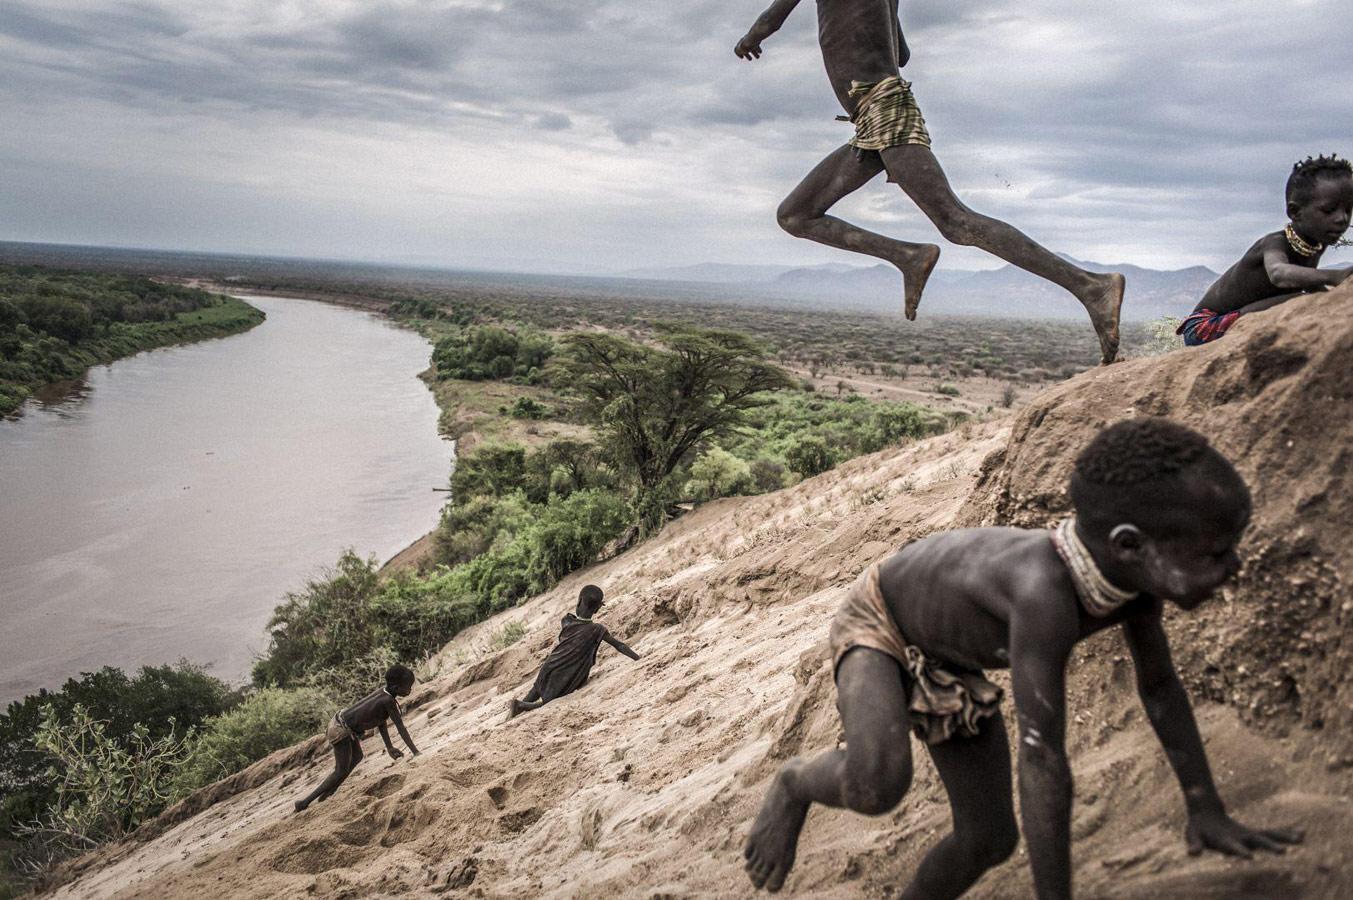 Фаусто Подавини / Fausto Podavini, Фотоконкурс World Press Photo 2018